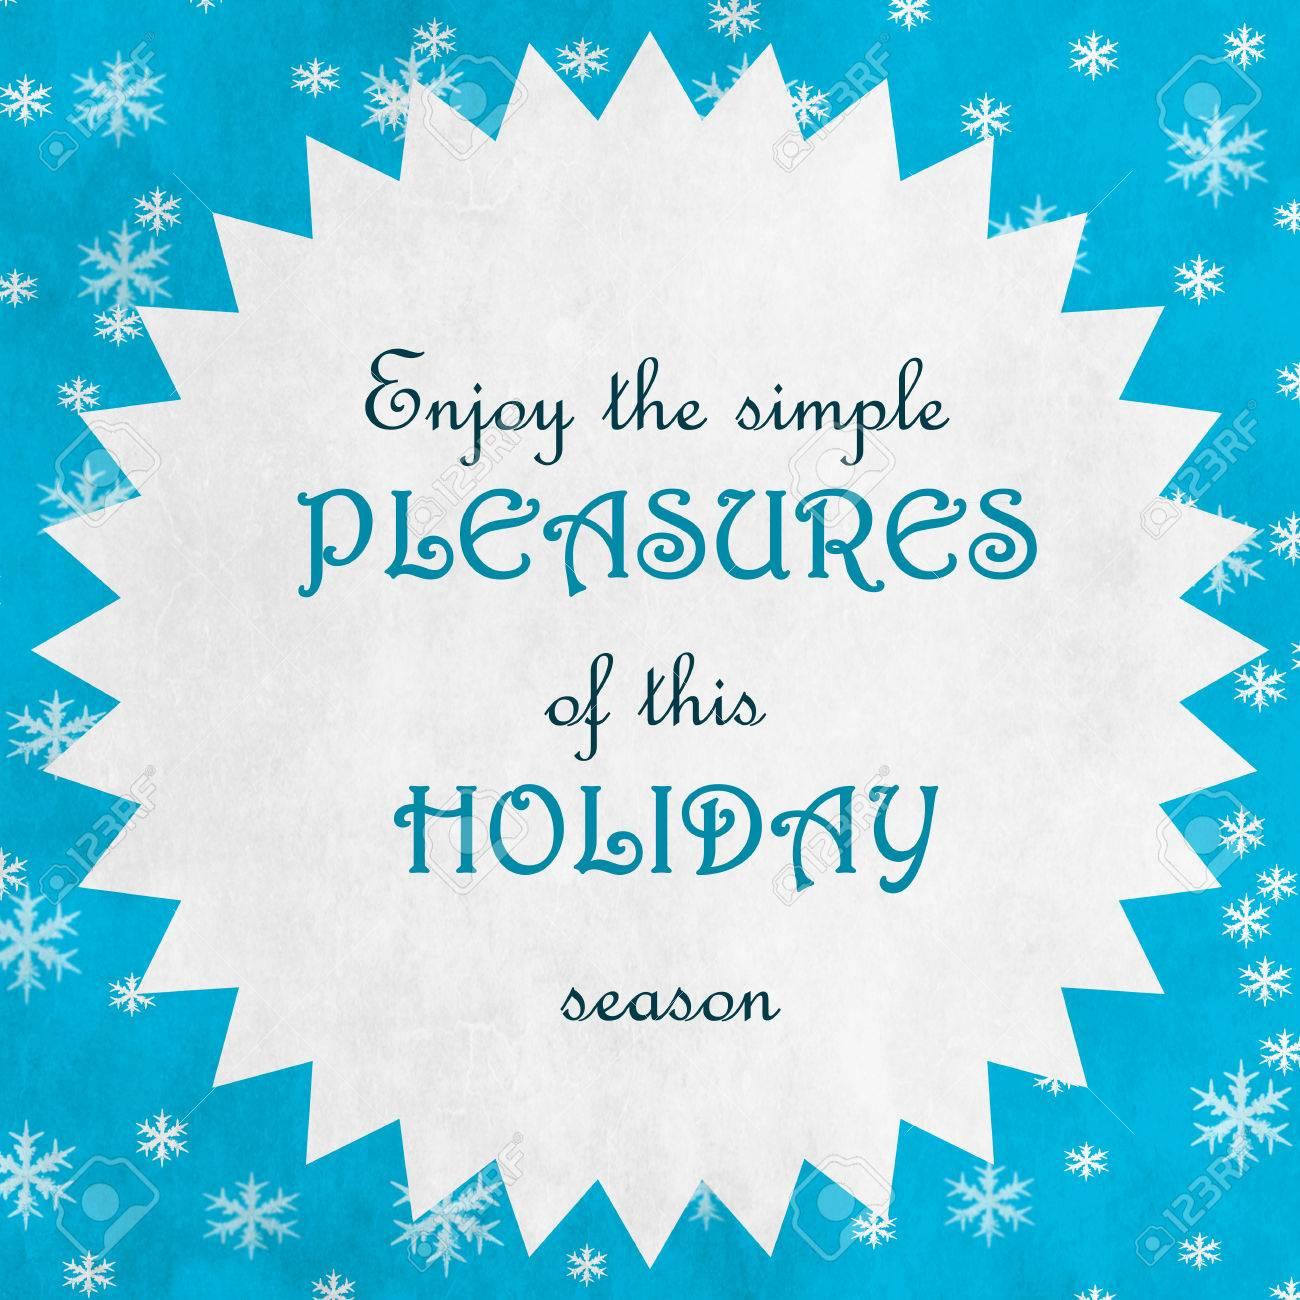 Merry christmas season greetings quote stock photo picture and merry christmas season greetings quote stock photo 34123058 m4hsunfo